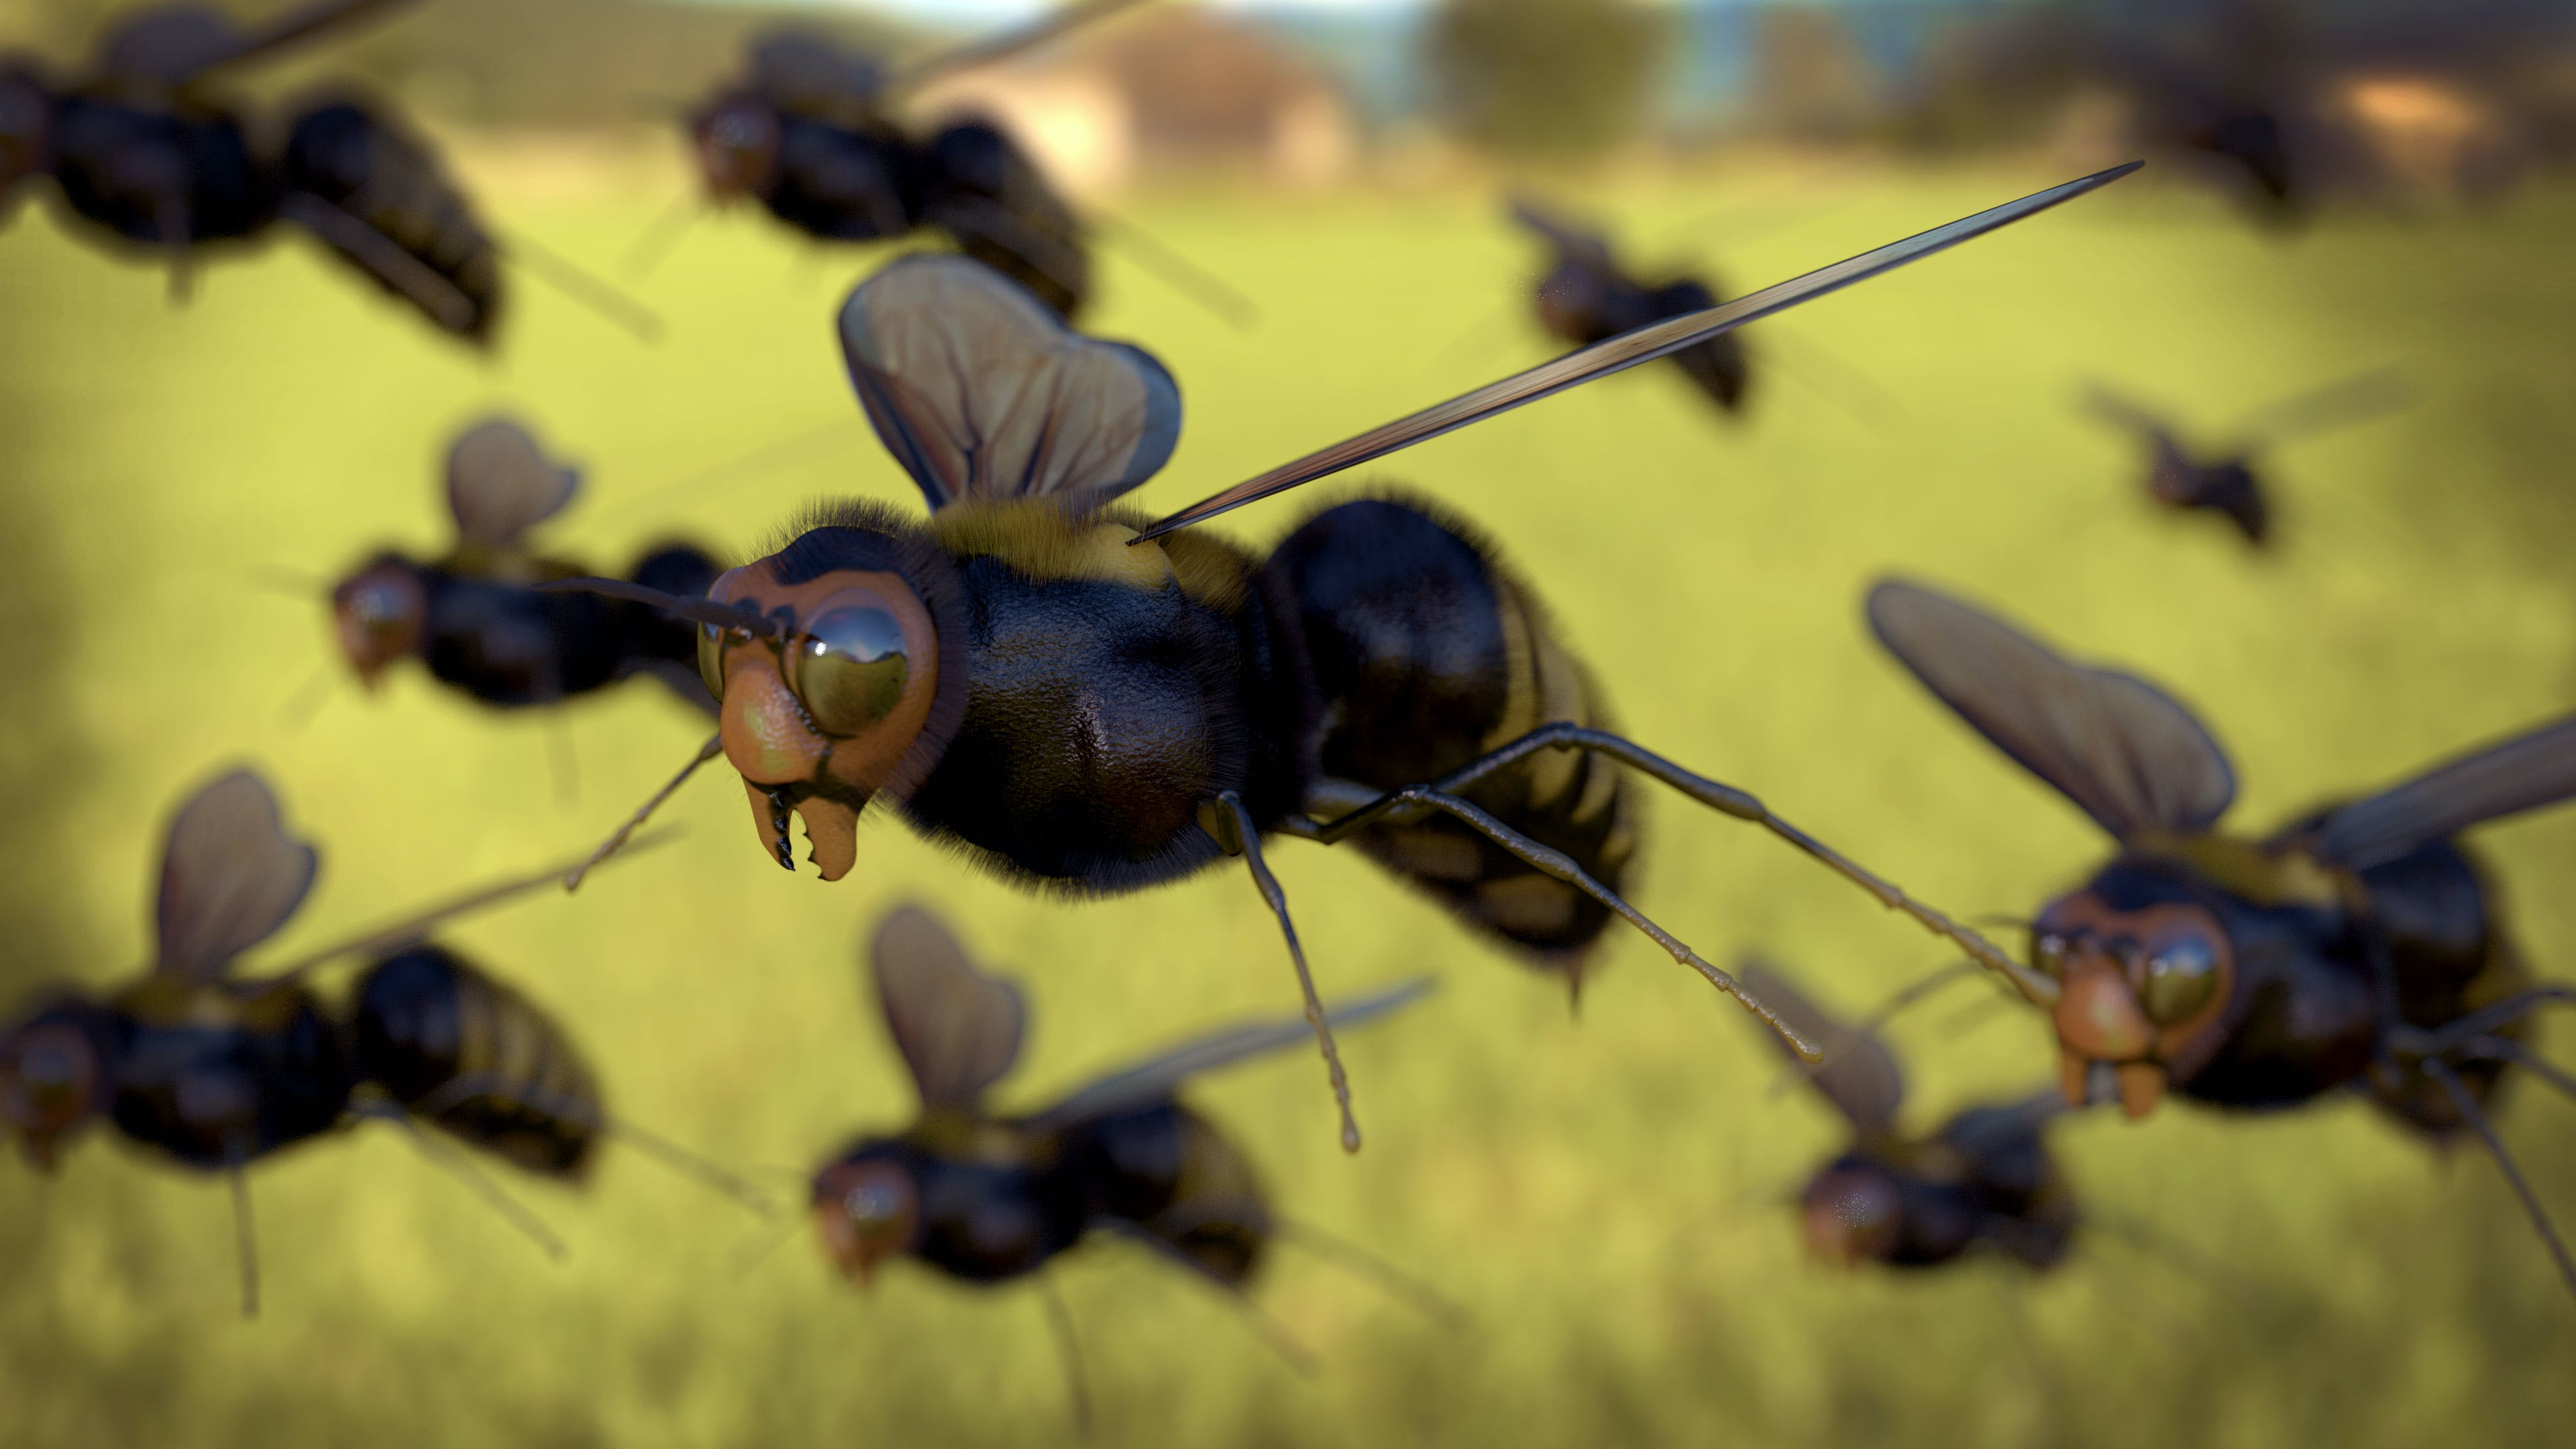 Kostenloses Stock Foto zu biene, fliegen, honigbiene, insekten